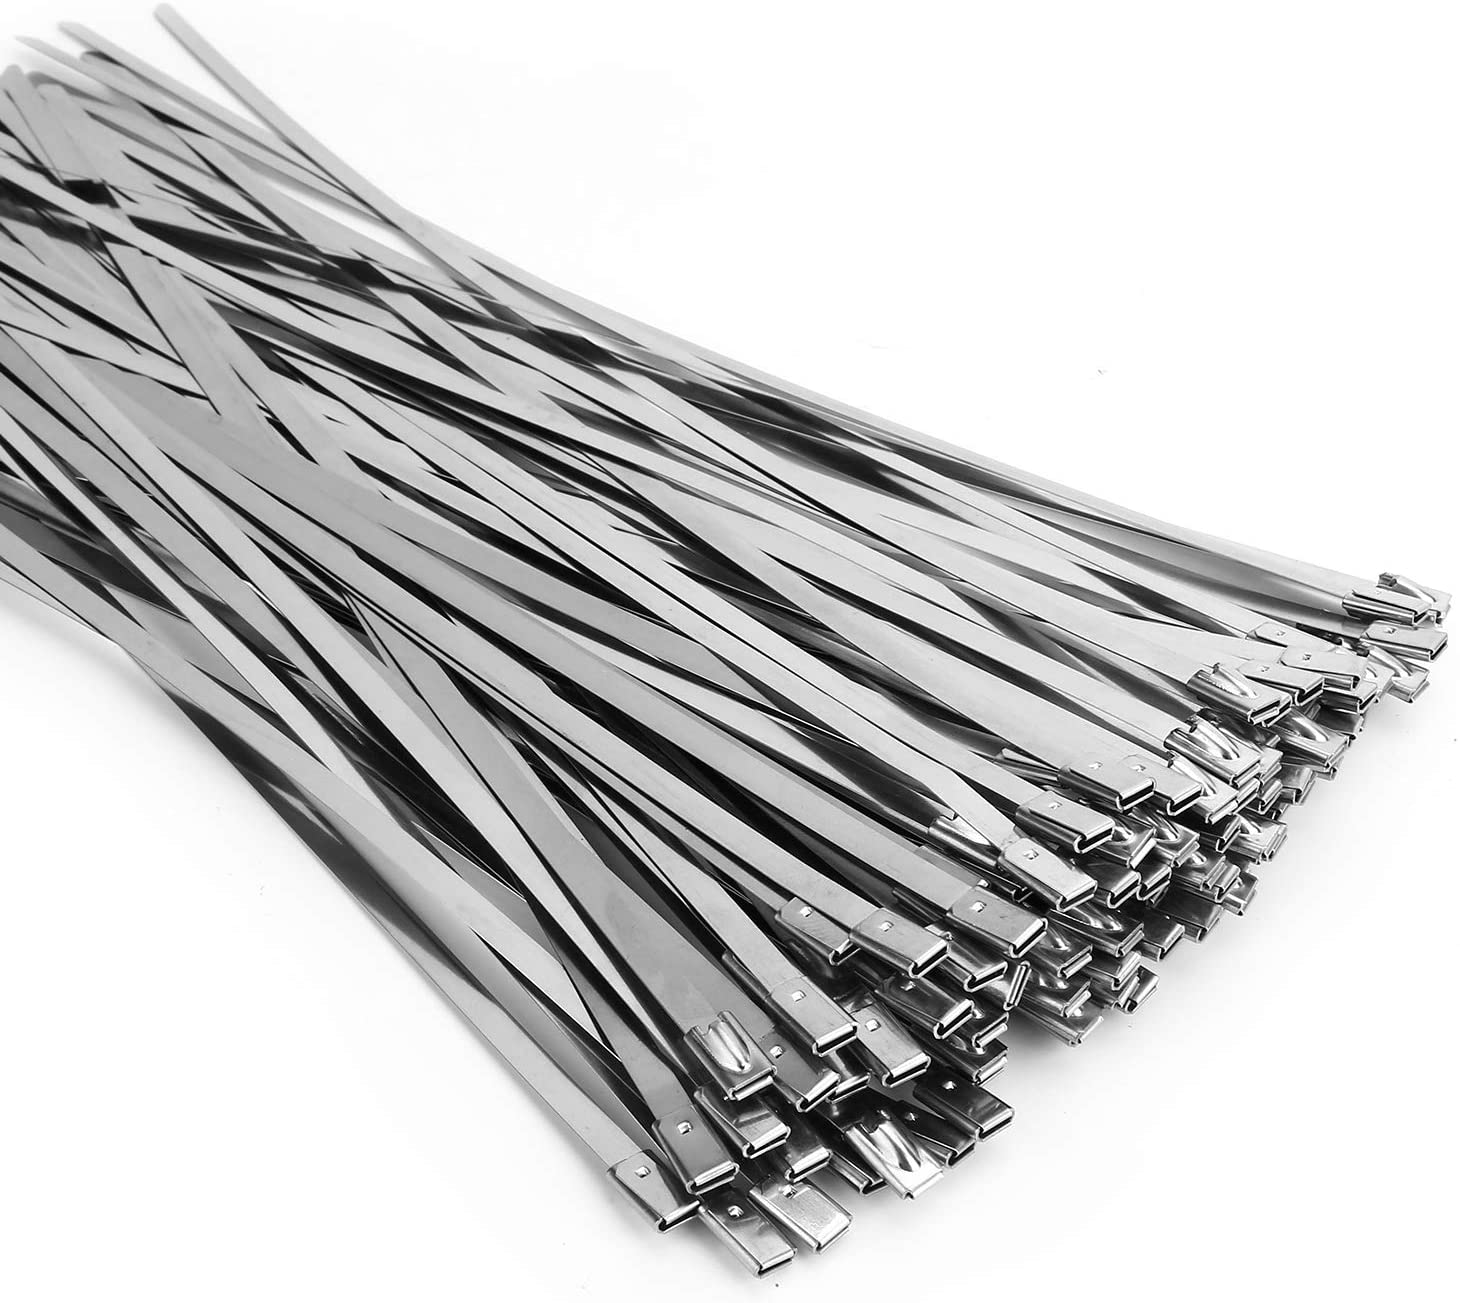 (100PCS 11.8 인치) 금속 케이블 지퍼 타이 304 스테인레스 스틸 다목적 중장비 셀프 잠금 케이블 타이 배기 포장 울타리 야외 및 캐노피 등에 적합